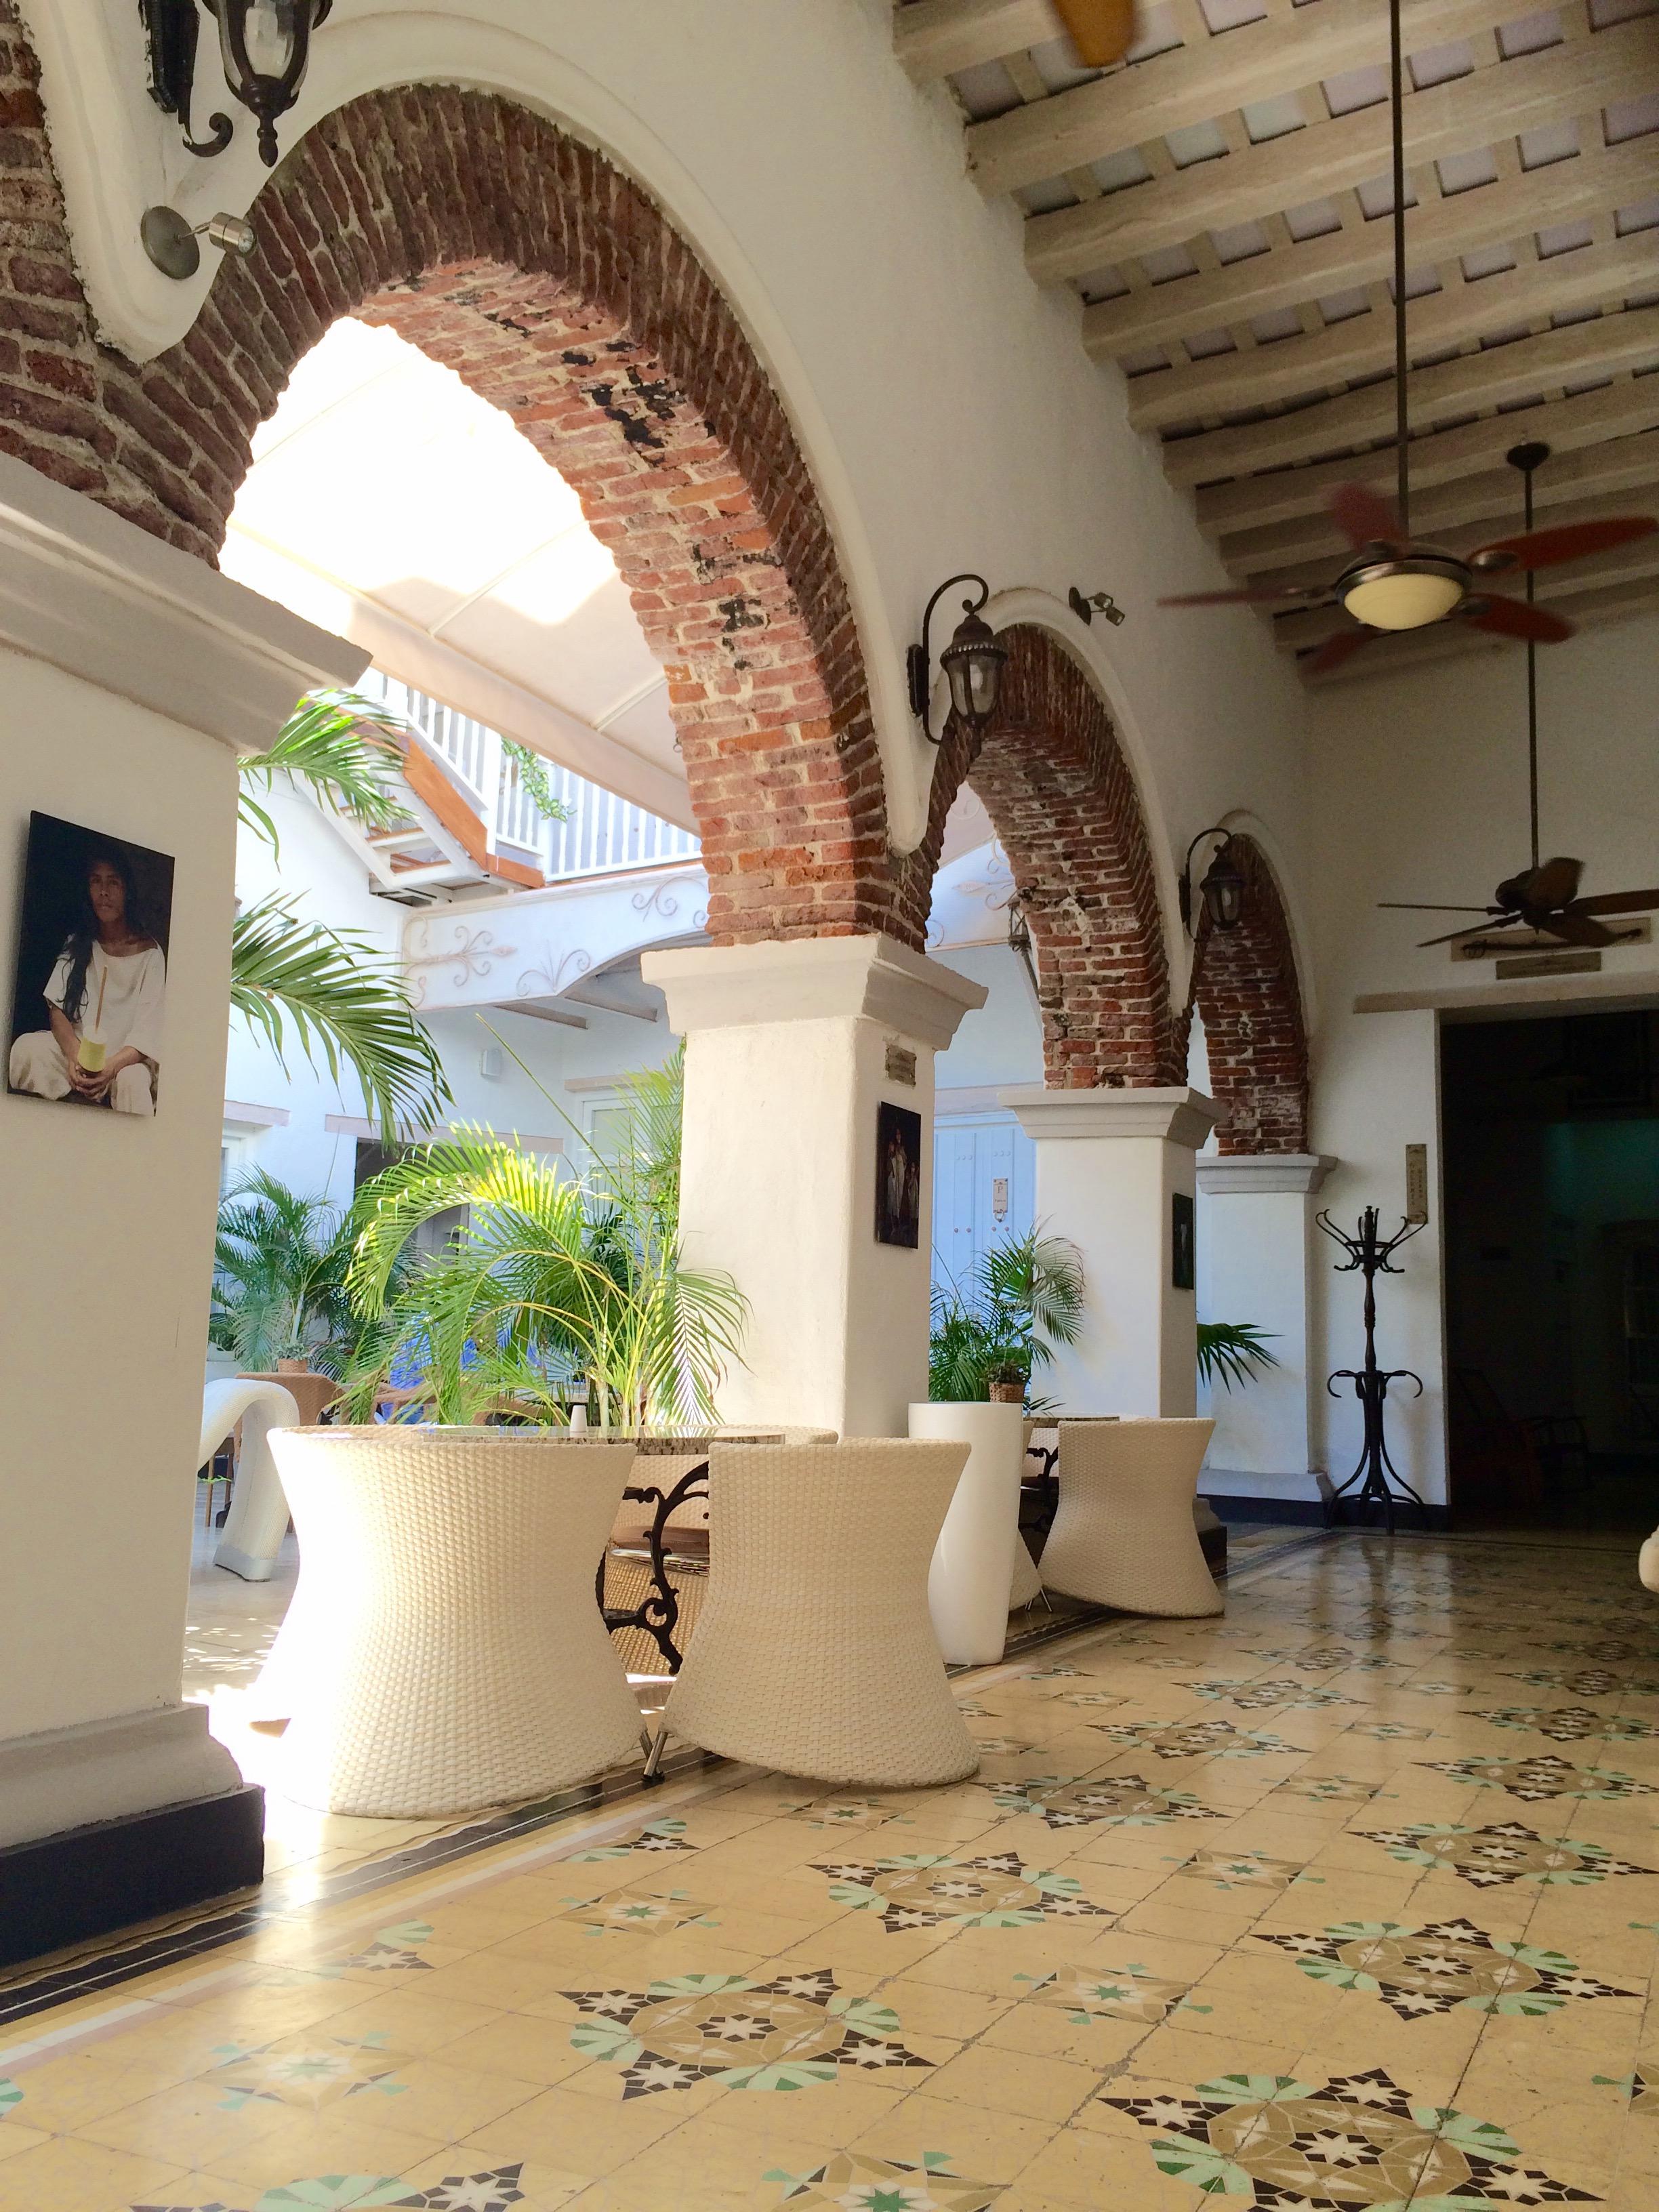 Georgia Ezra Interior designer Hotel Design Santa Marta Columbia Brick archways.jpg